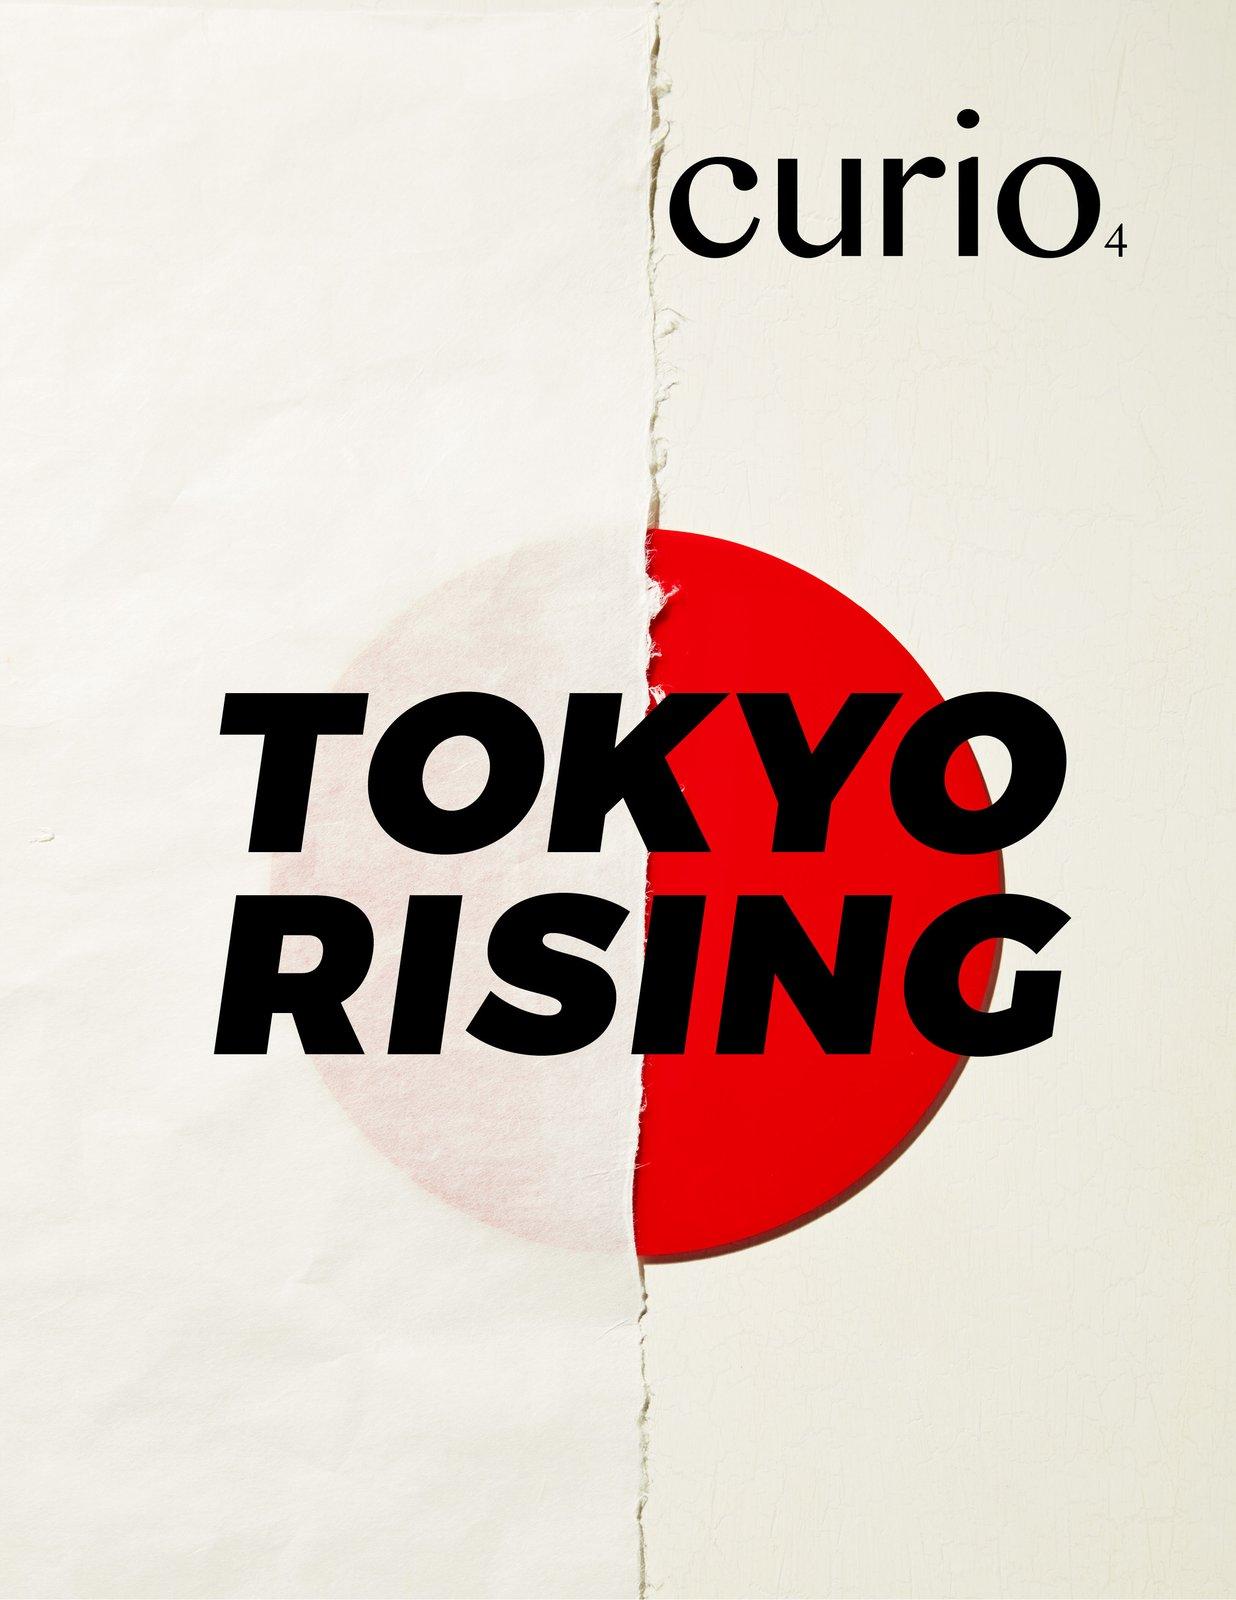 Photo 2 of 17 in curio 4: tokyo rising